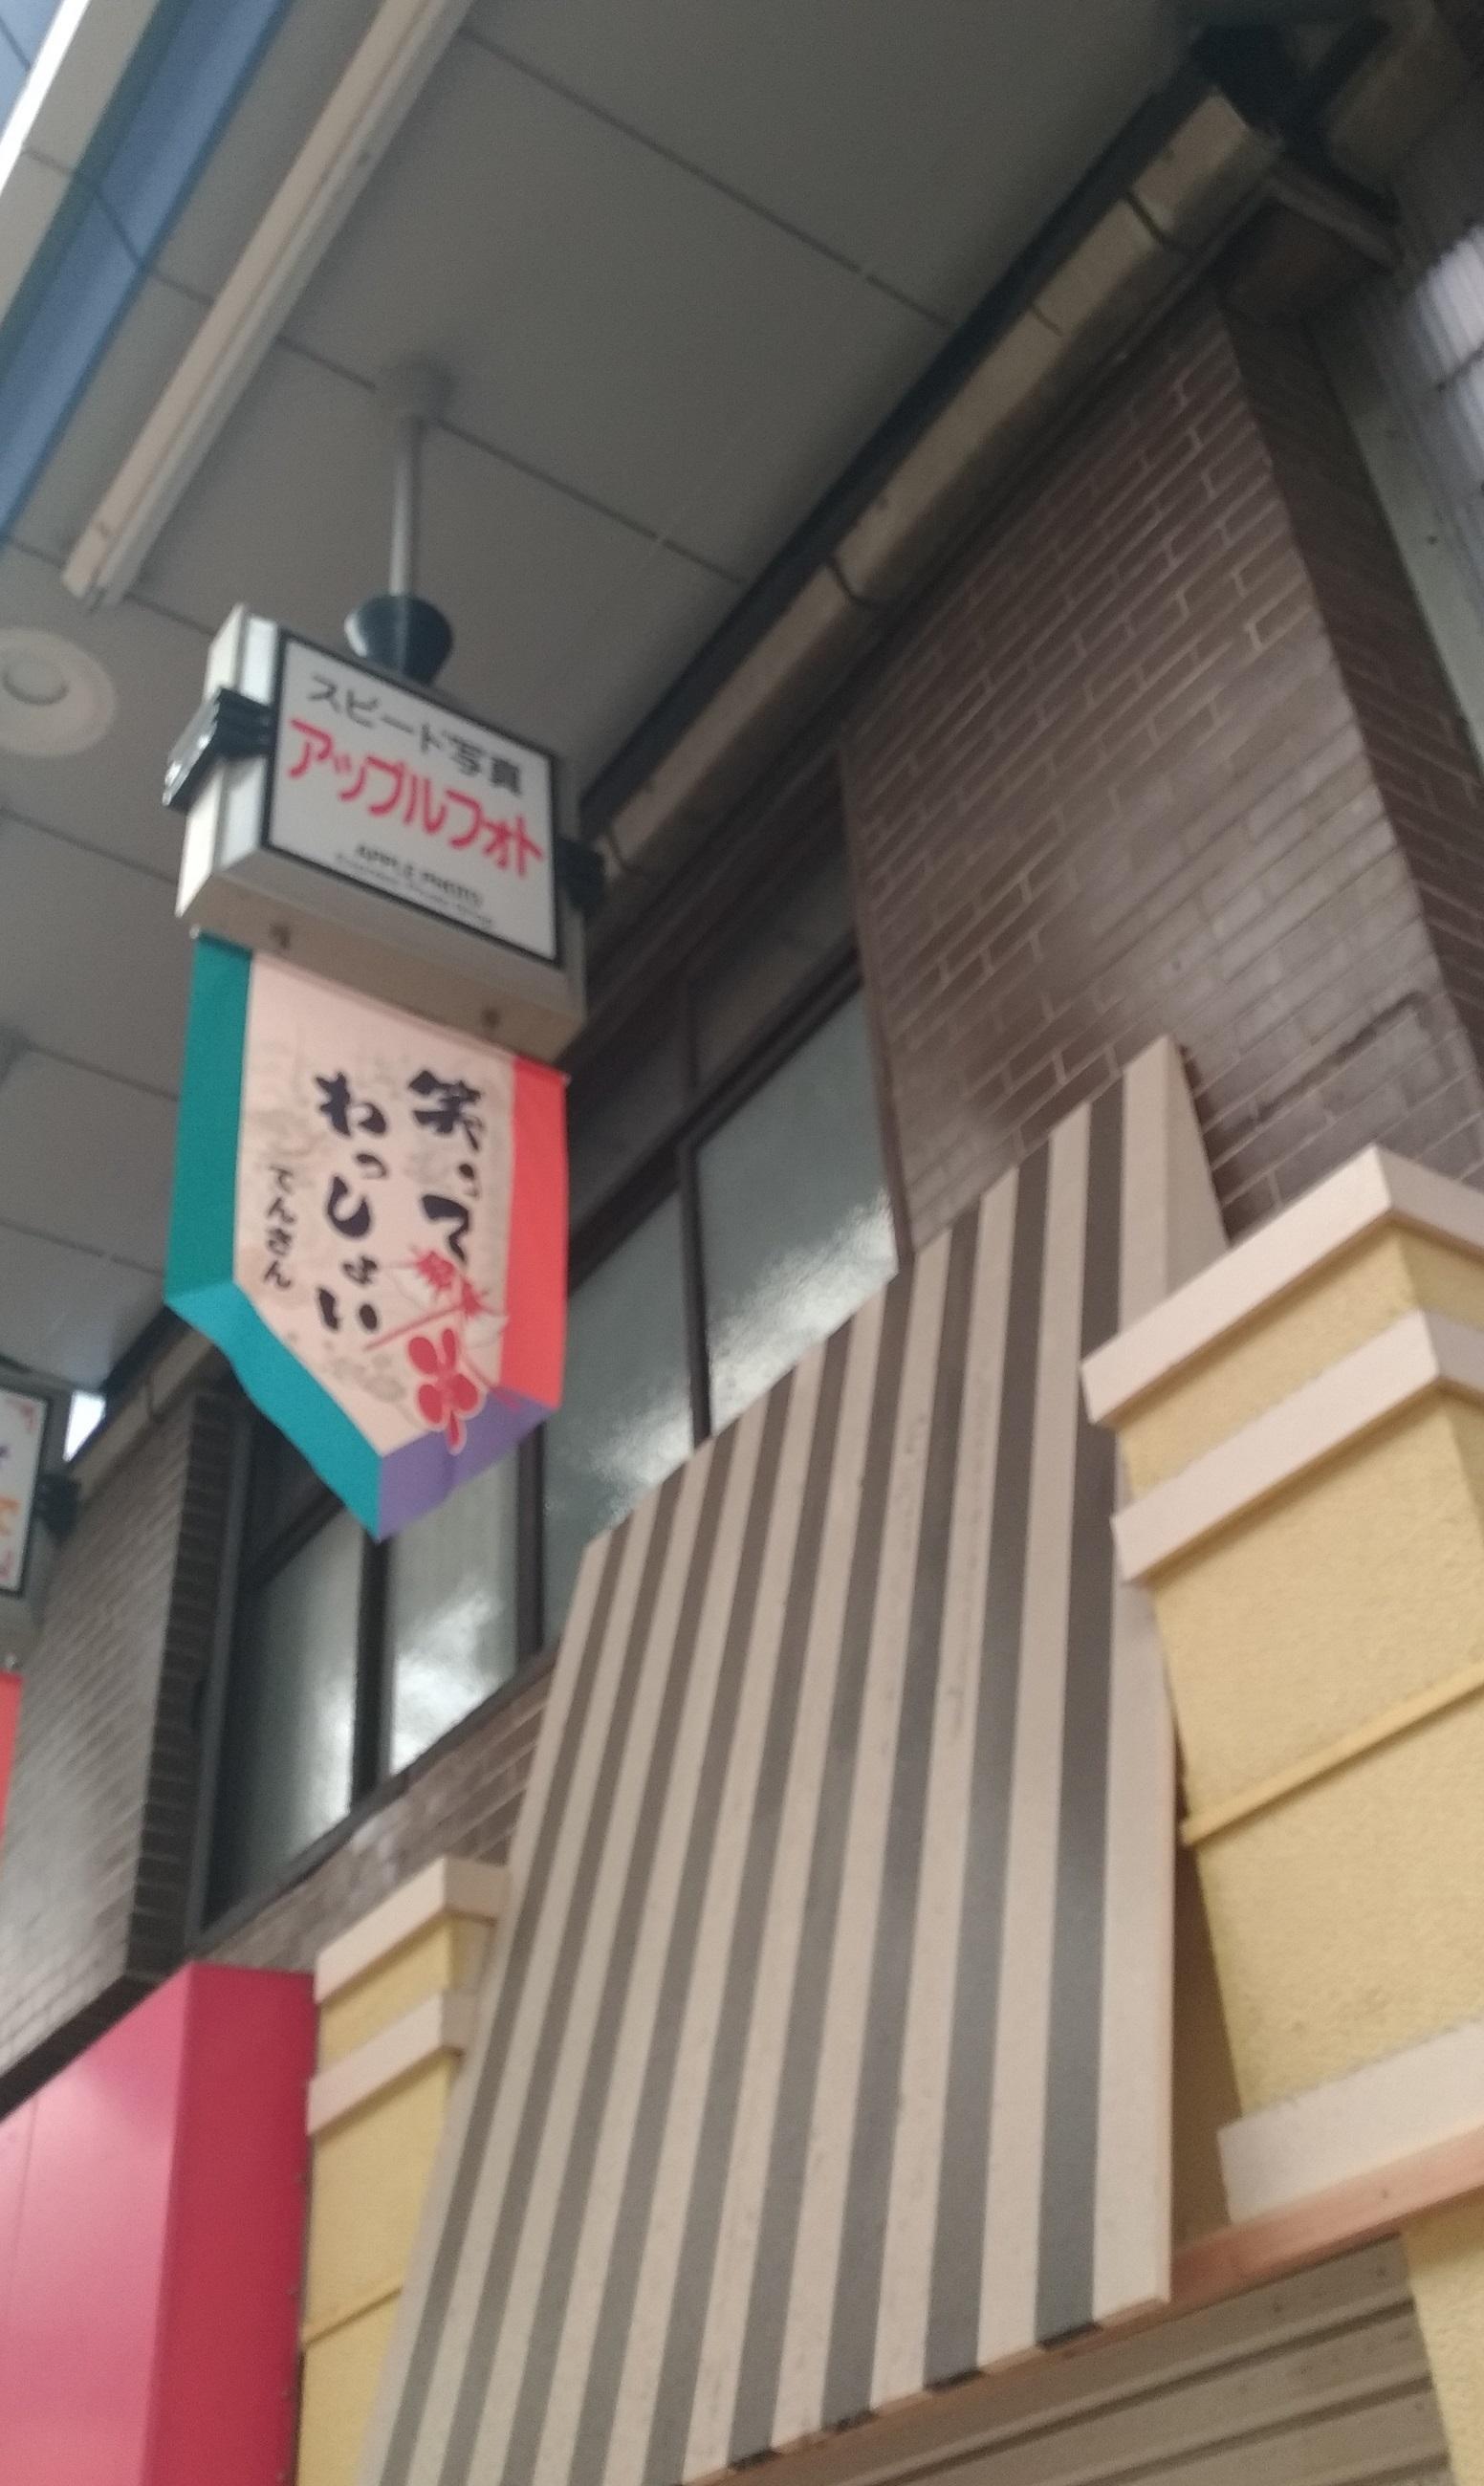 tenma_tapioka_dronk0720_1.jpg